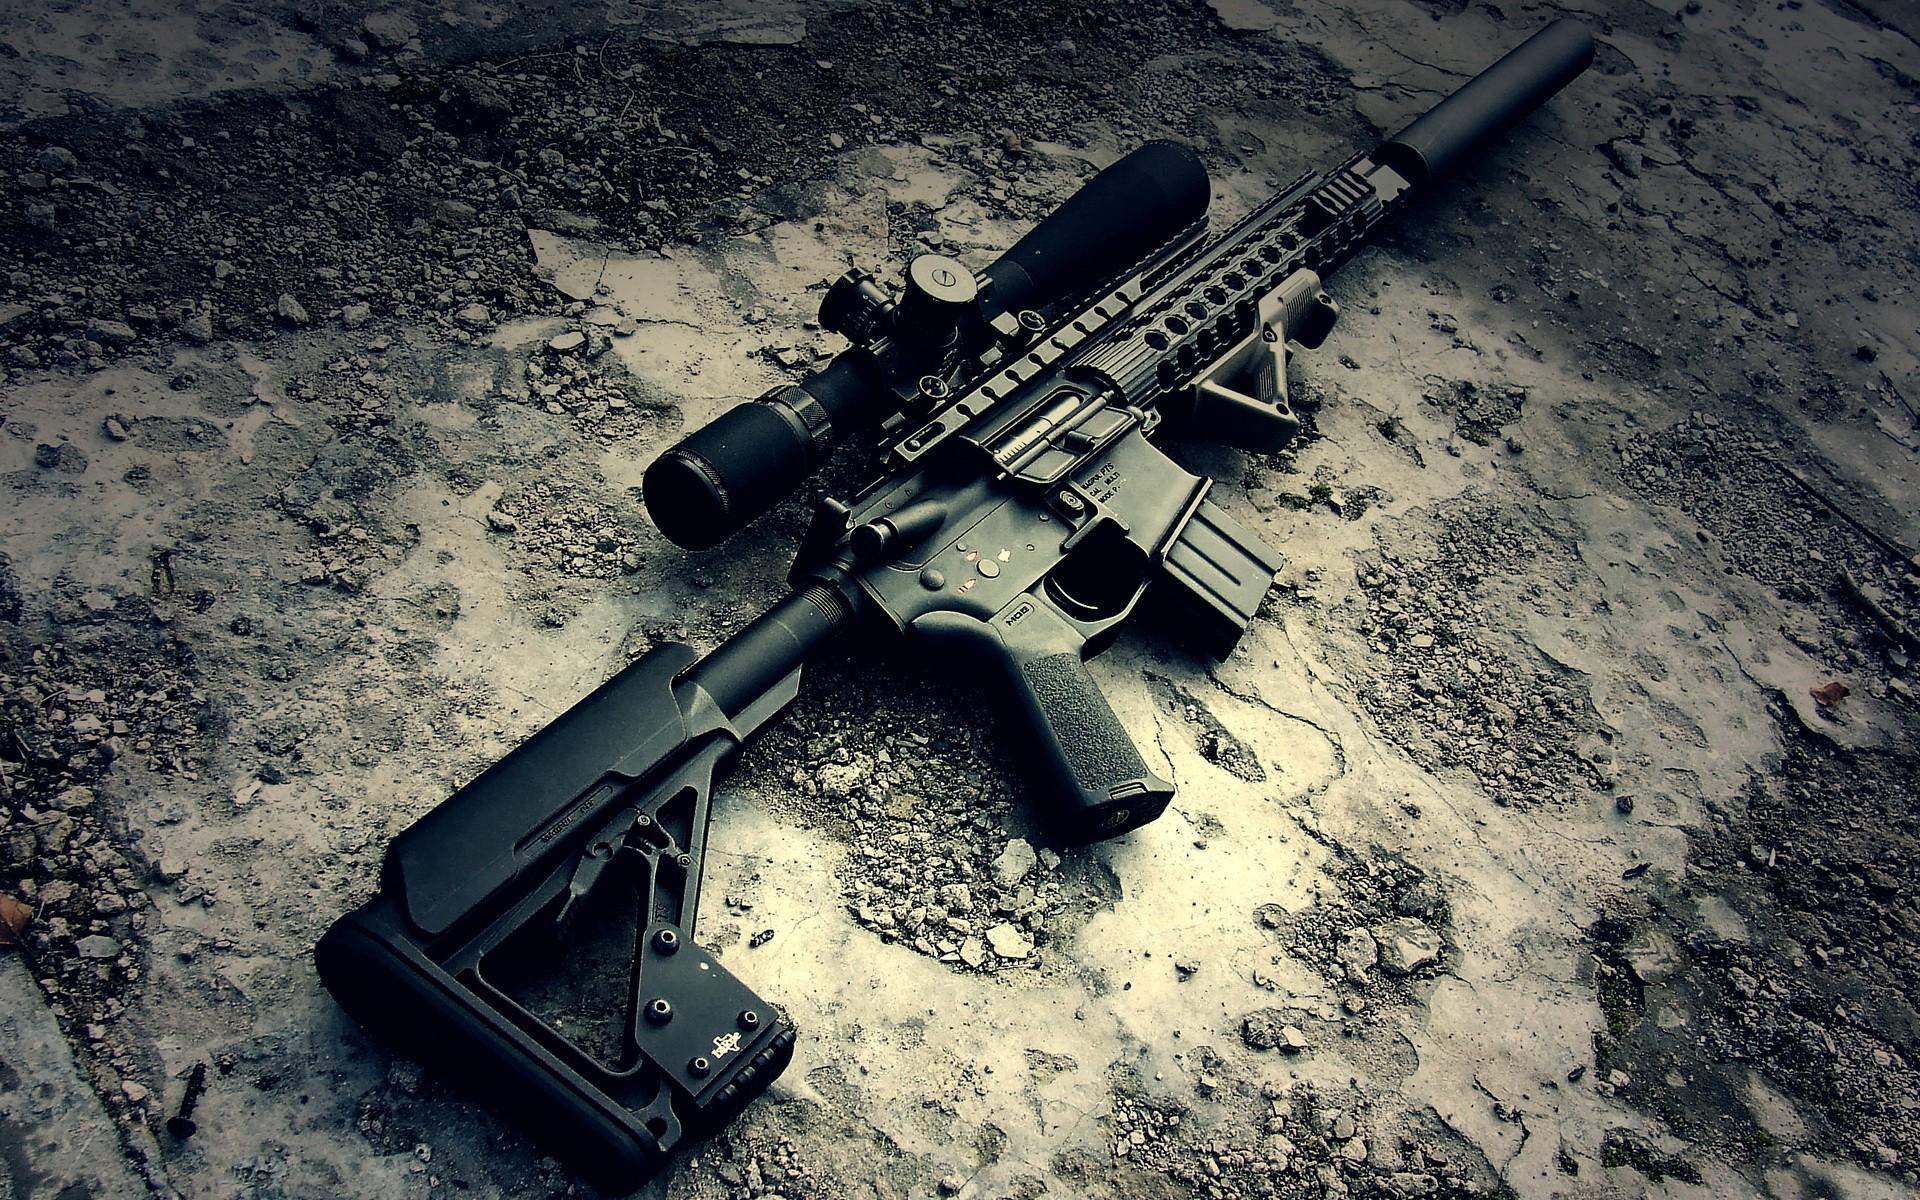 Assault Rifle for Airsoft, airsoft, gray, gun, military, rifle